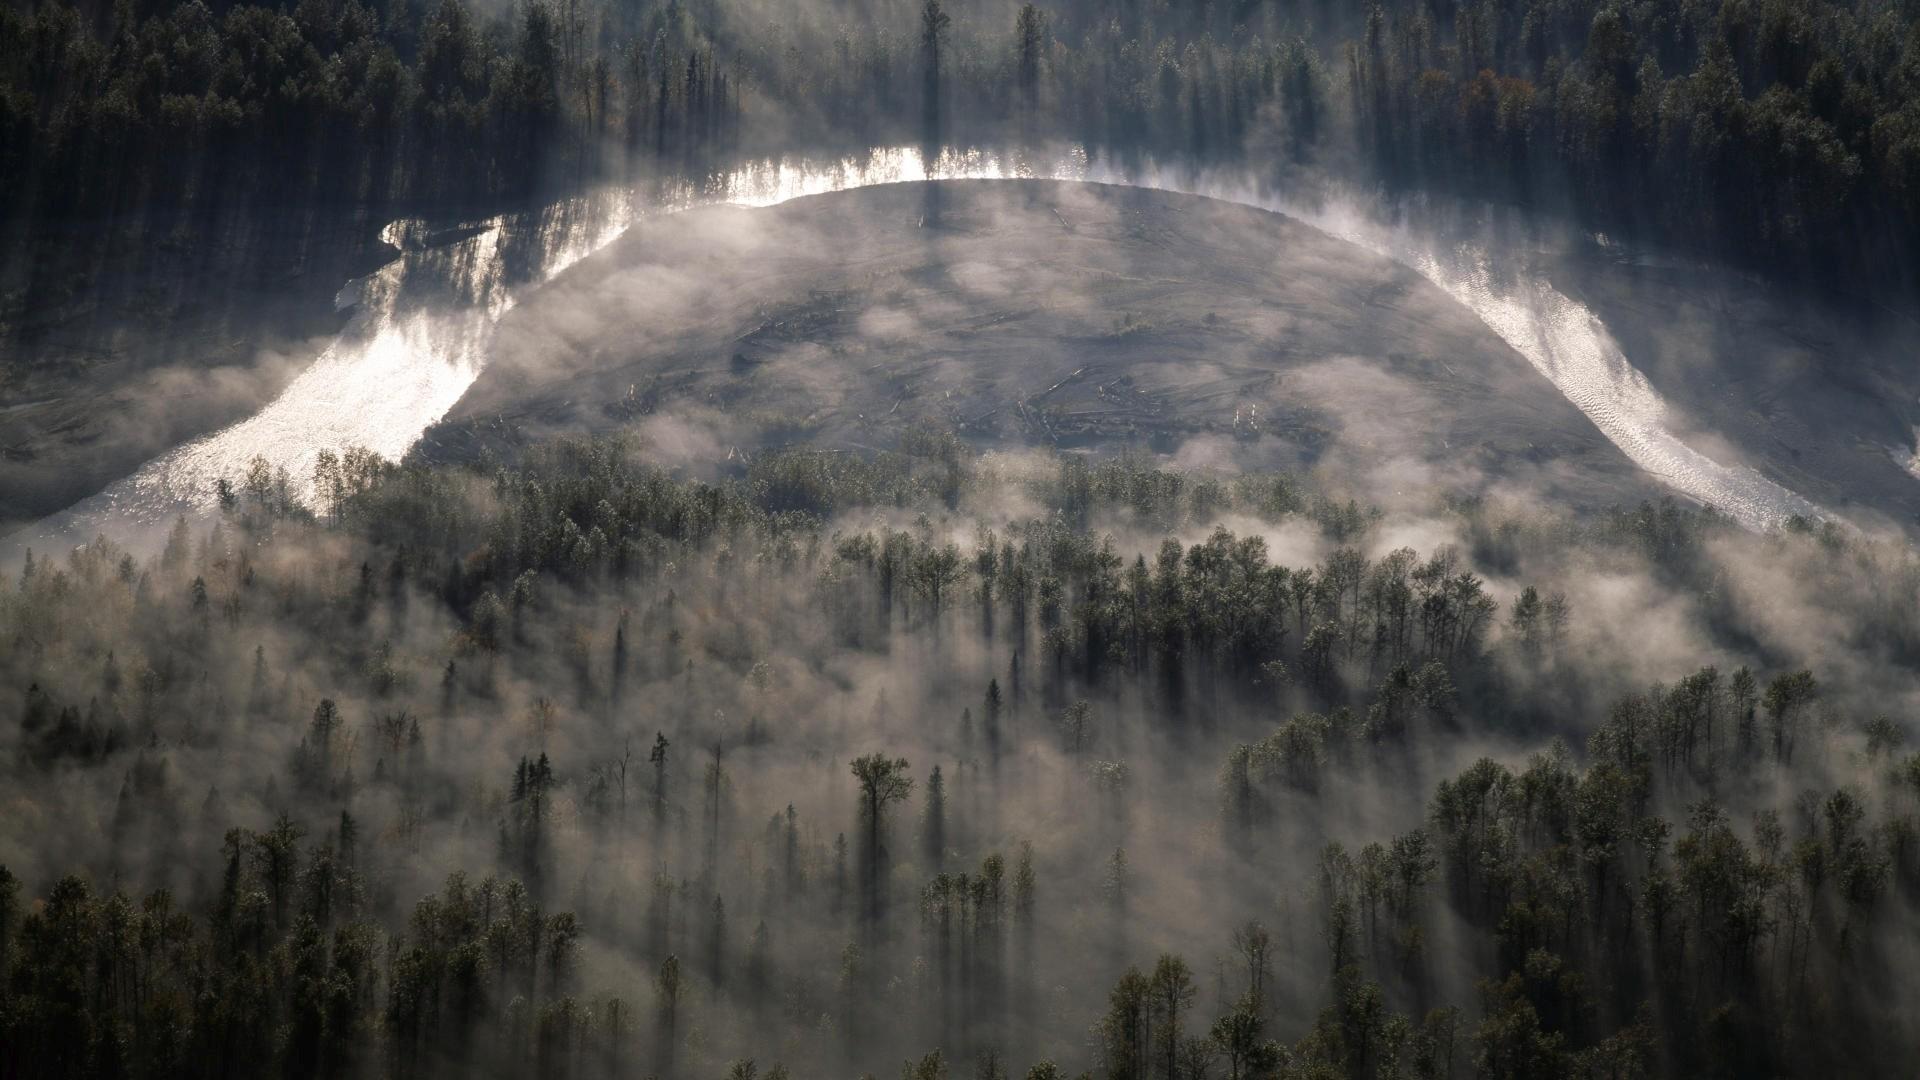 https://wallpaperrs.com/uploads/nature/foggy-pine-forest-wide-wallpaper-34293.jpg  | Tall Trees | Pinterest